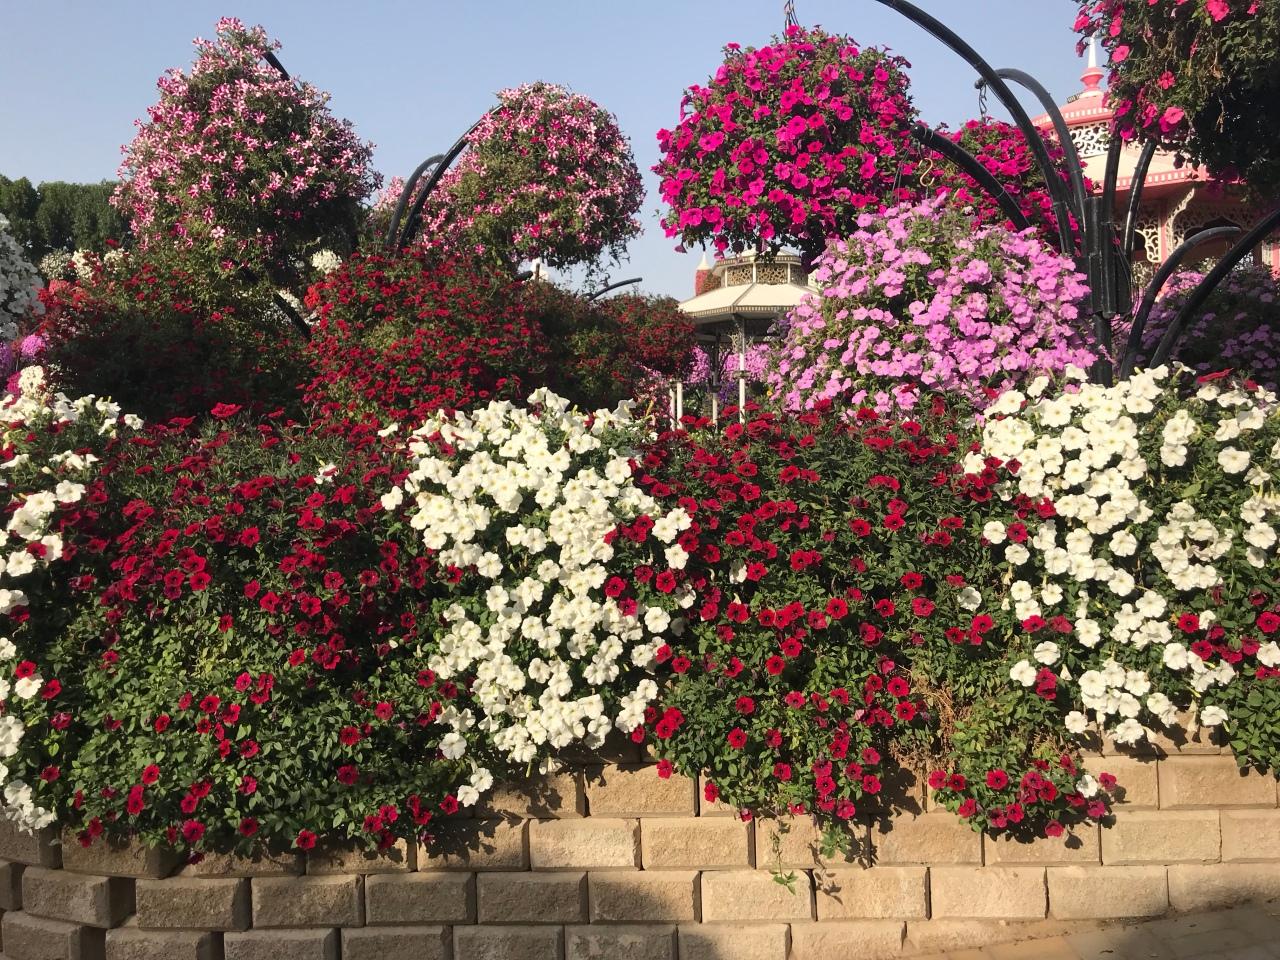 Dubai Miracle Garden – Jöūrnêy wïth JČ